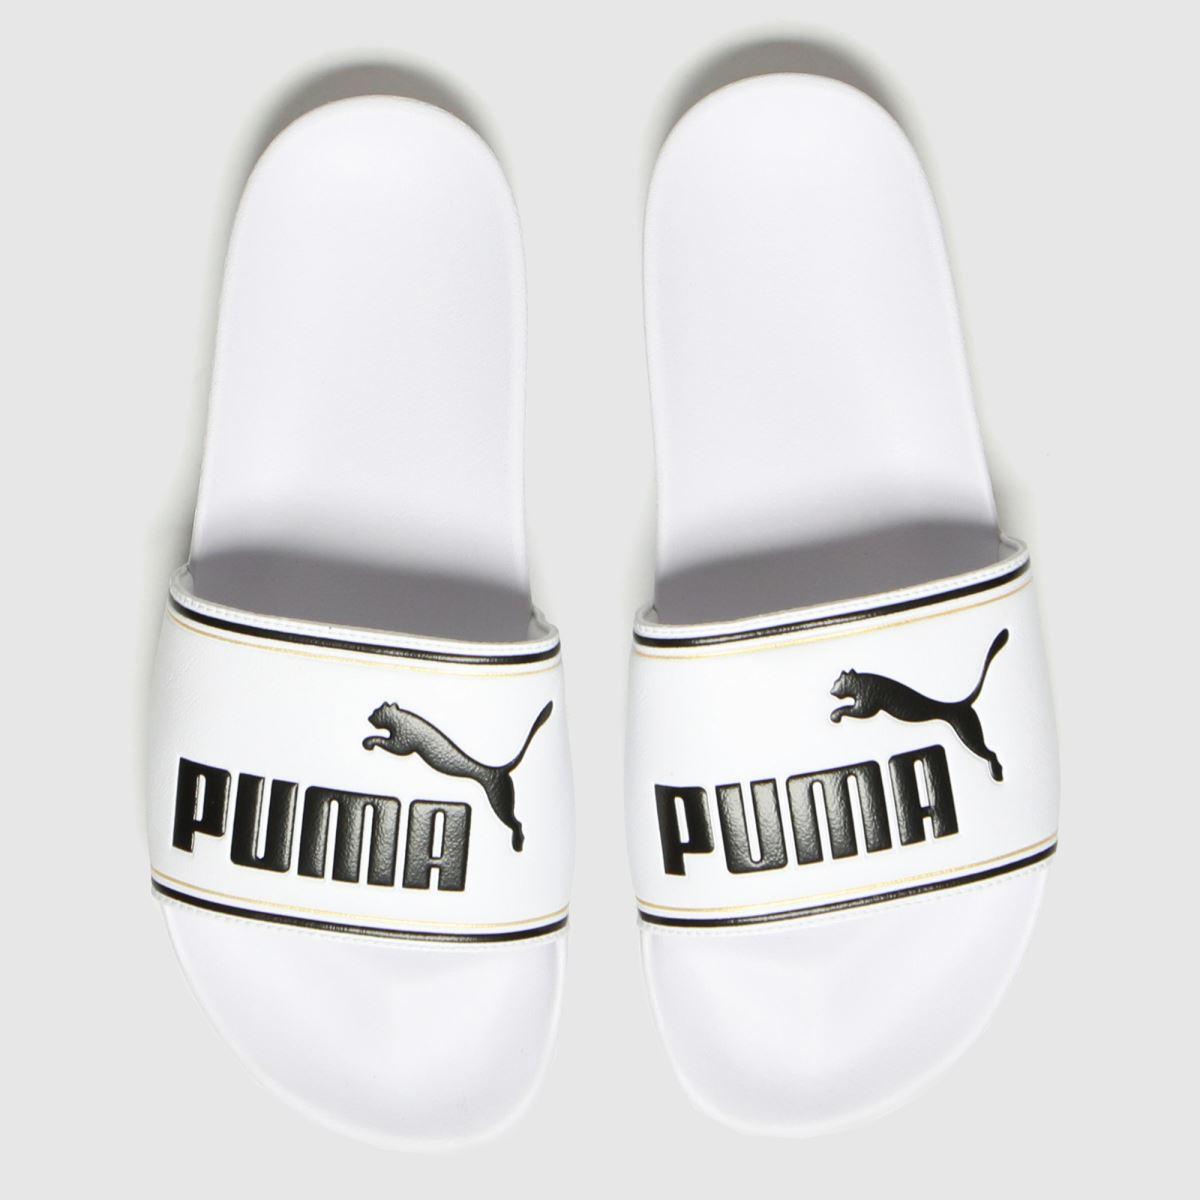 PUMA White Leadcat Ftr Sandals